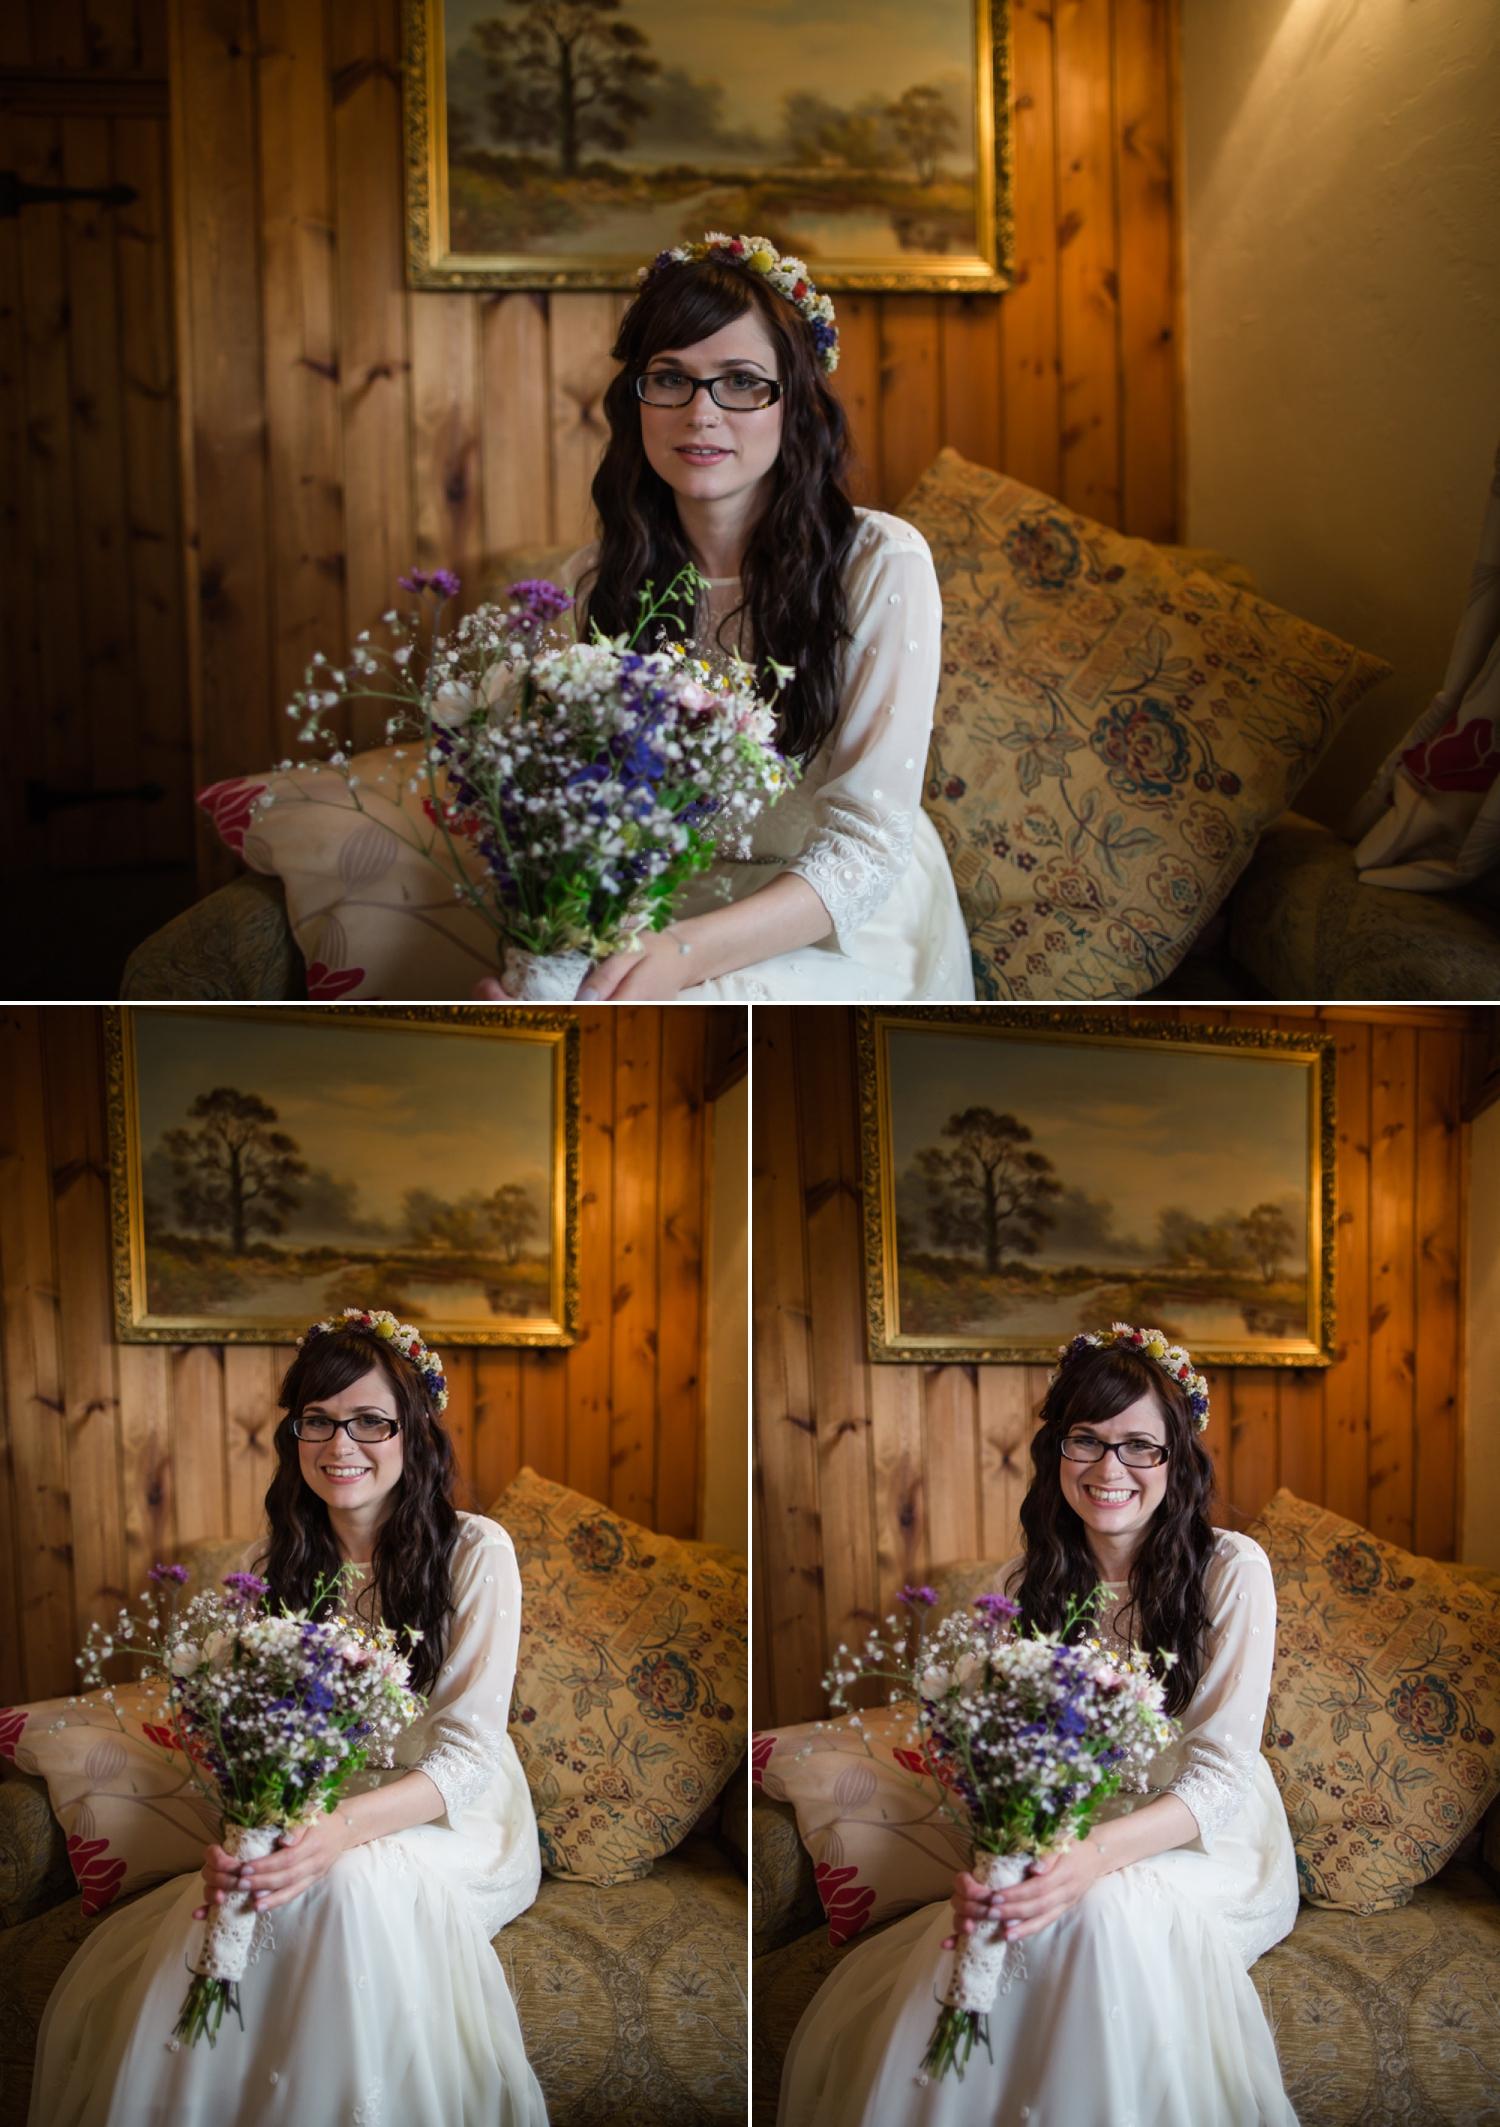 Somerset Wedding Photographer Elly & Liam 7